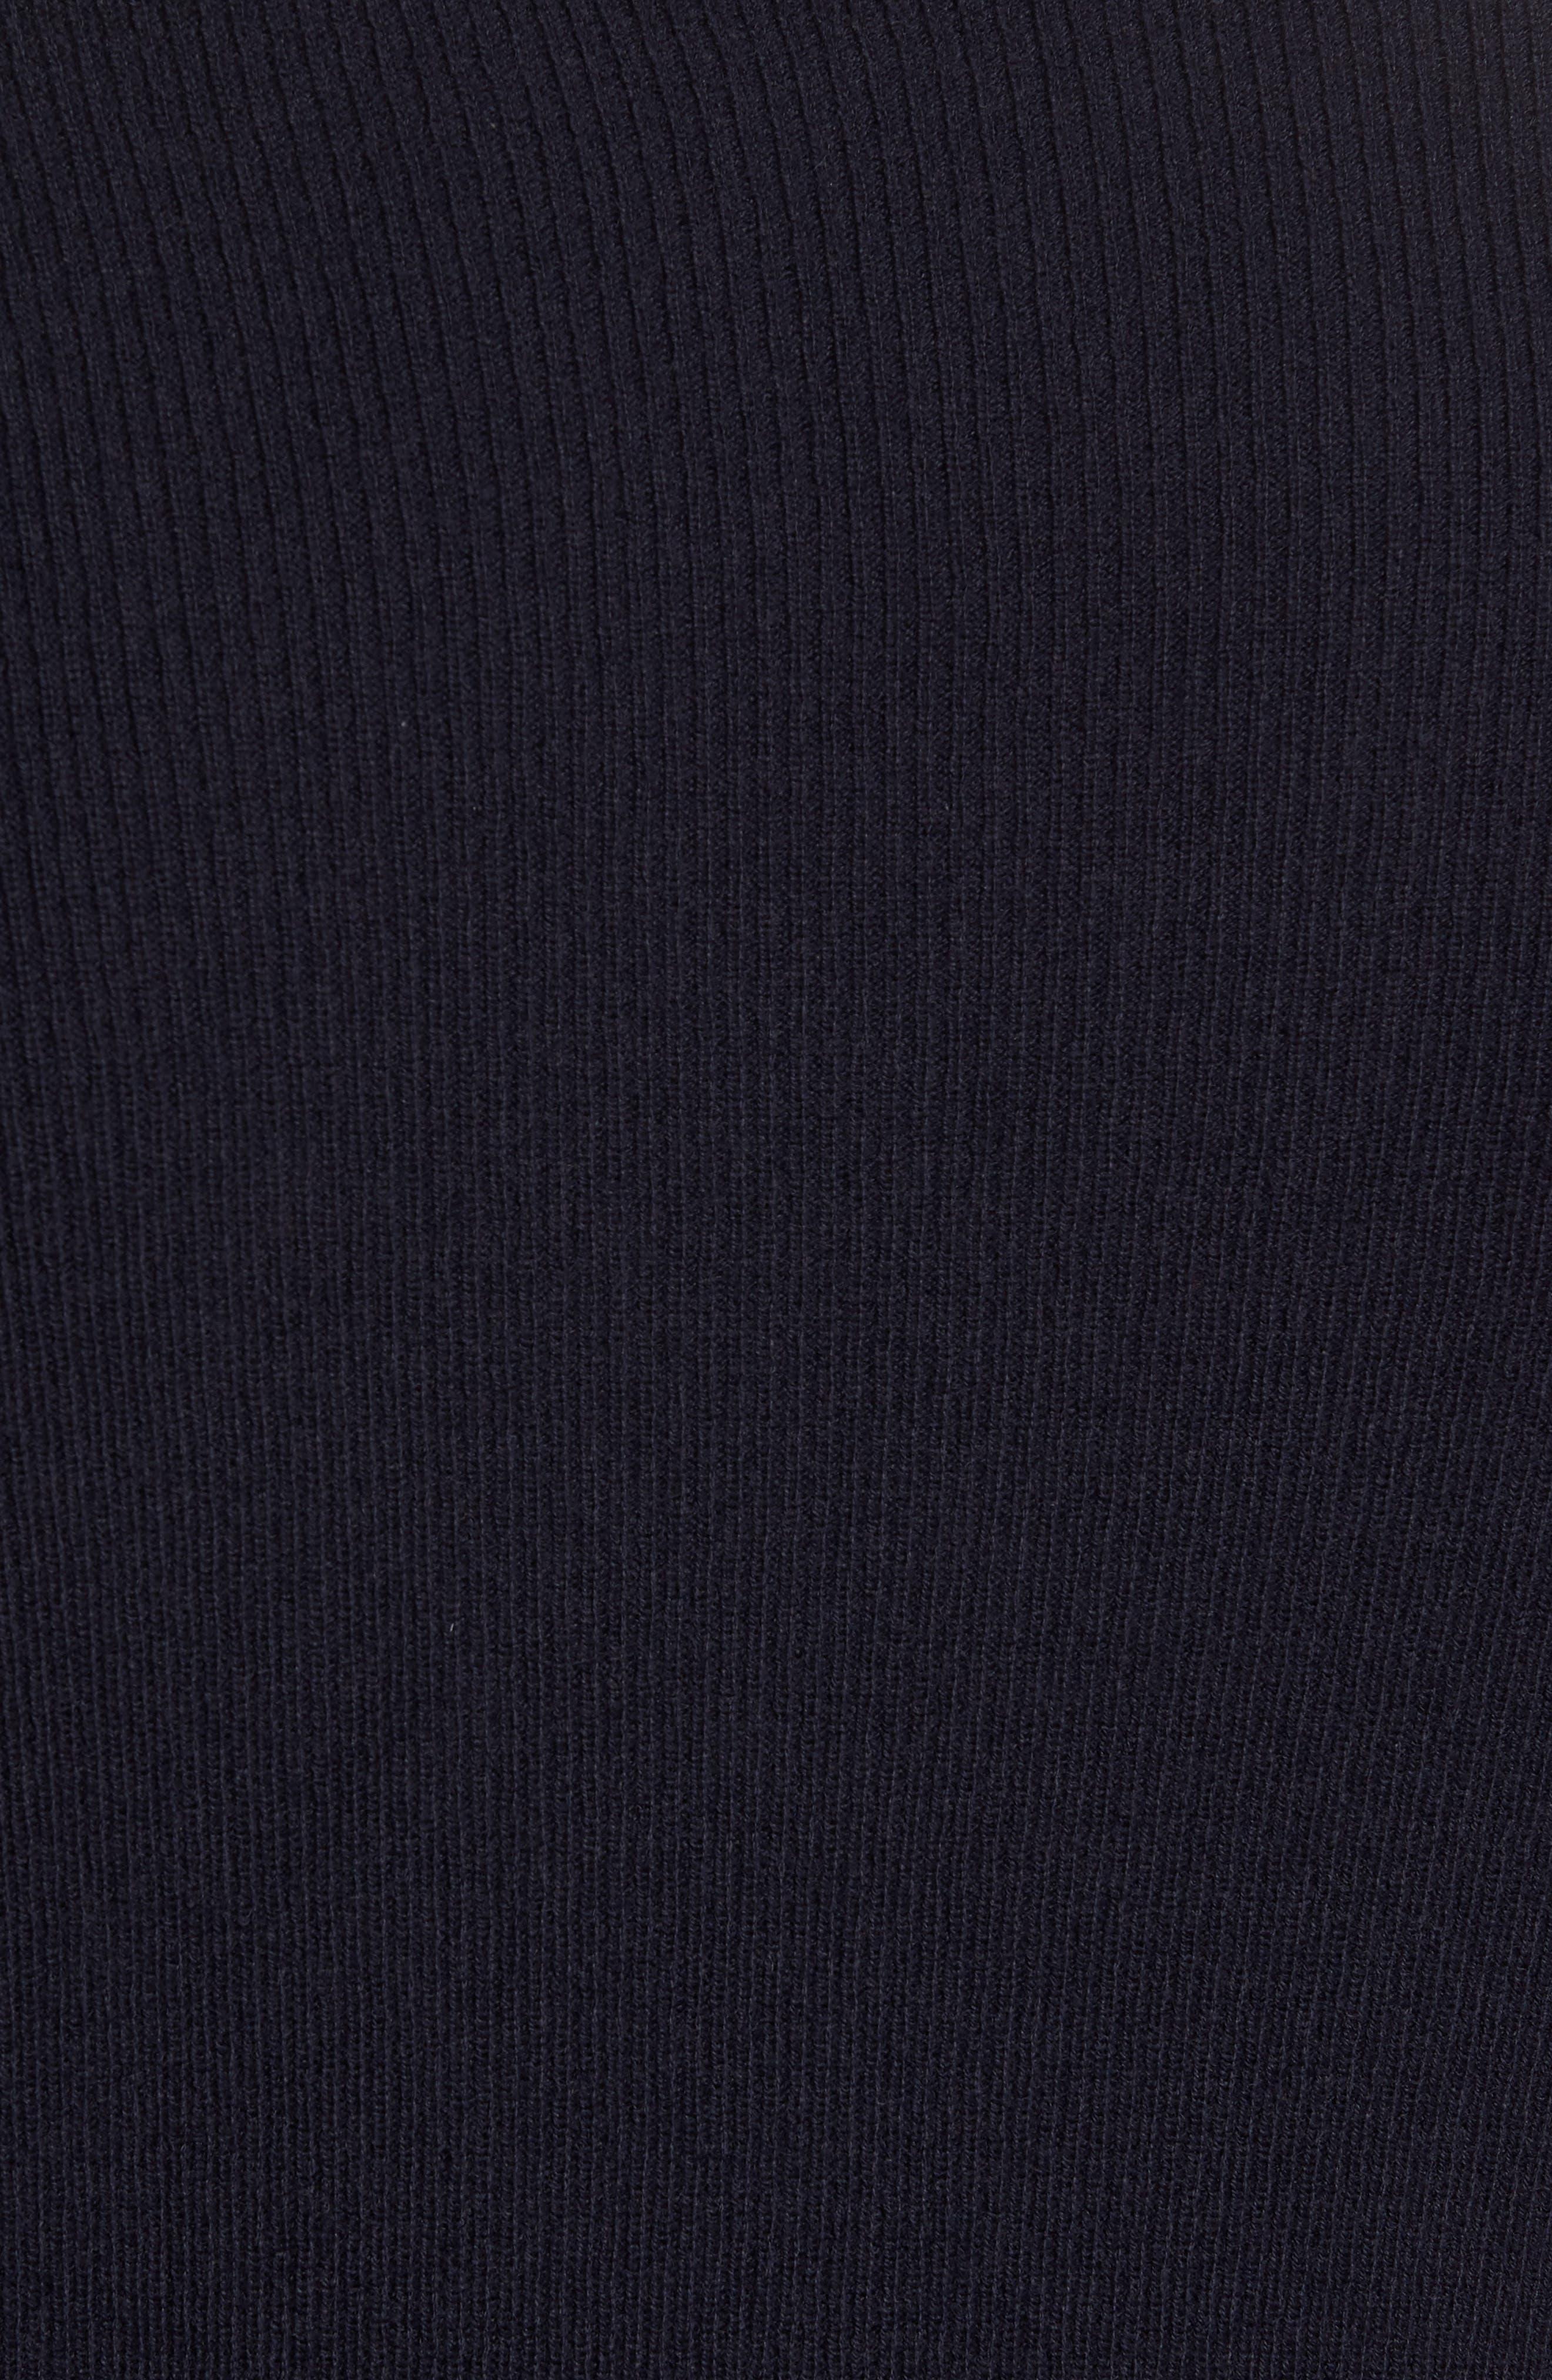 Colorblock Crewneck Sweater,                             Alternate thumbnail 6, color,                             Navy